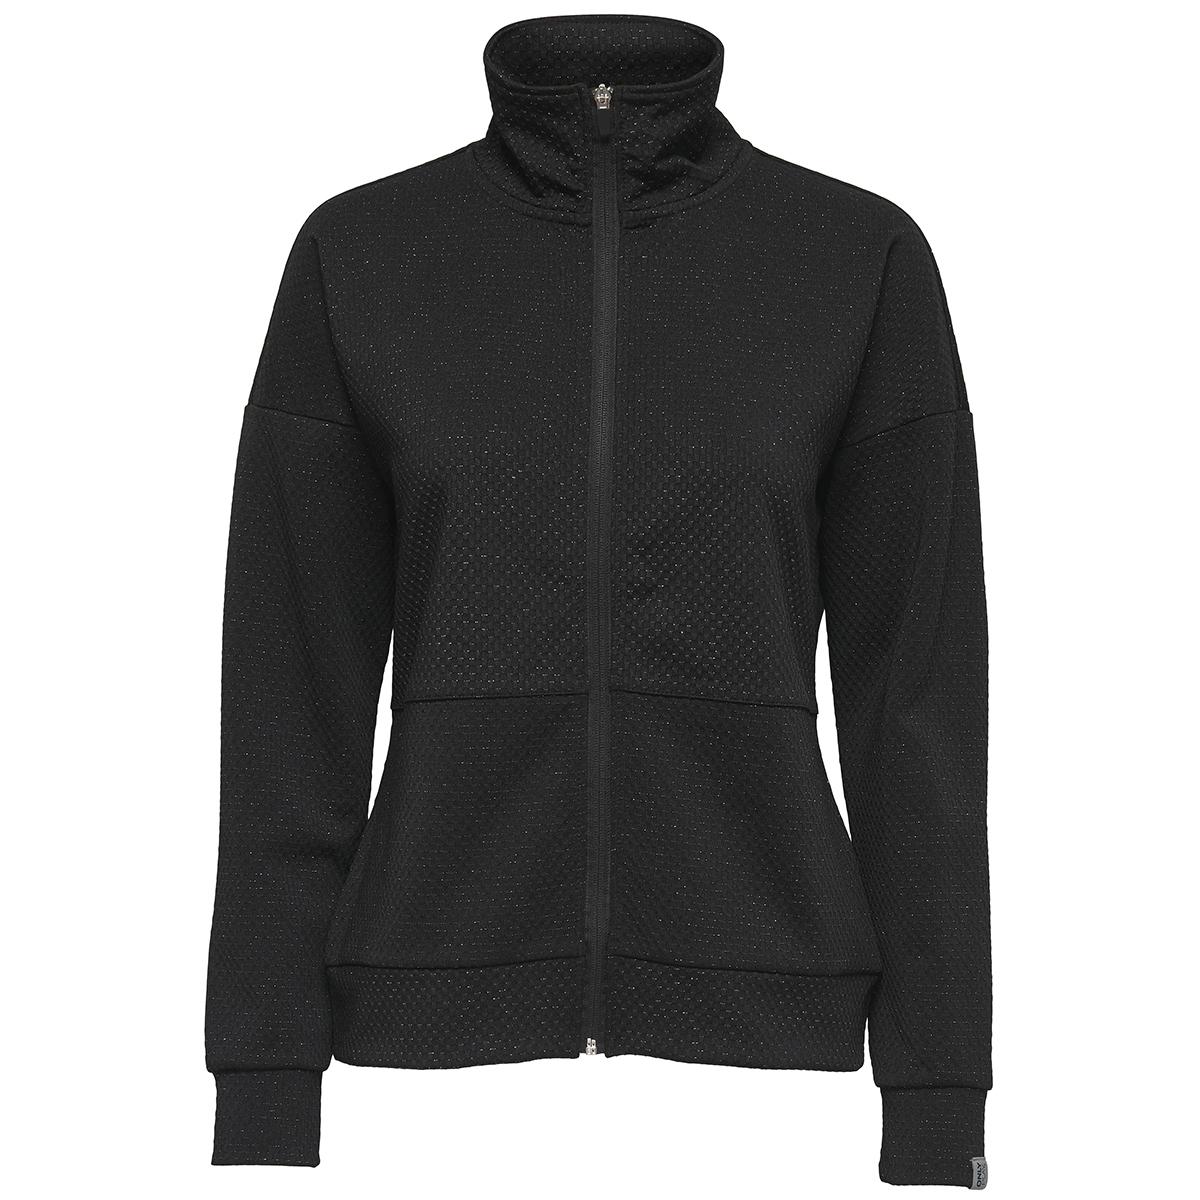 onpregina glitter zip sweat 15154991 only play sport vest black/w. glitter